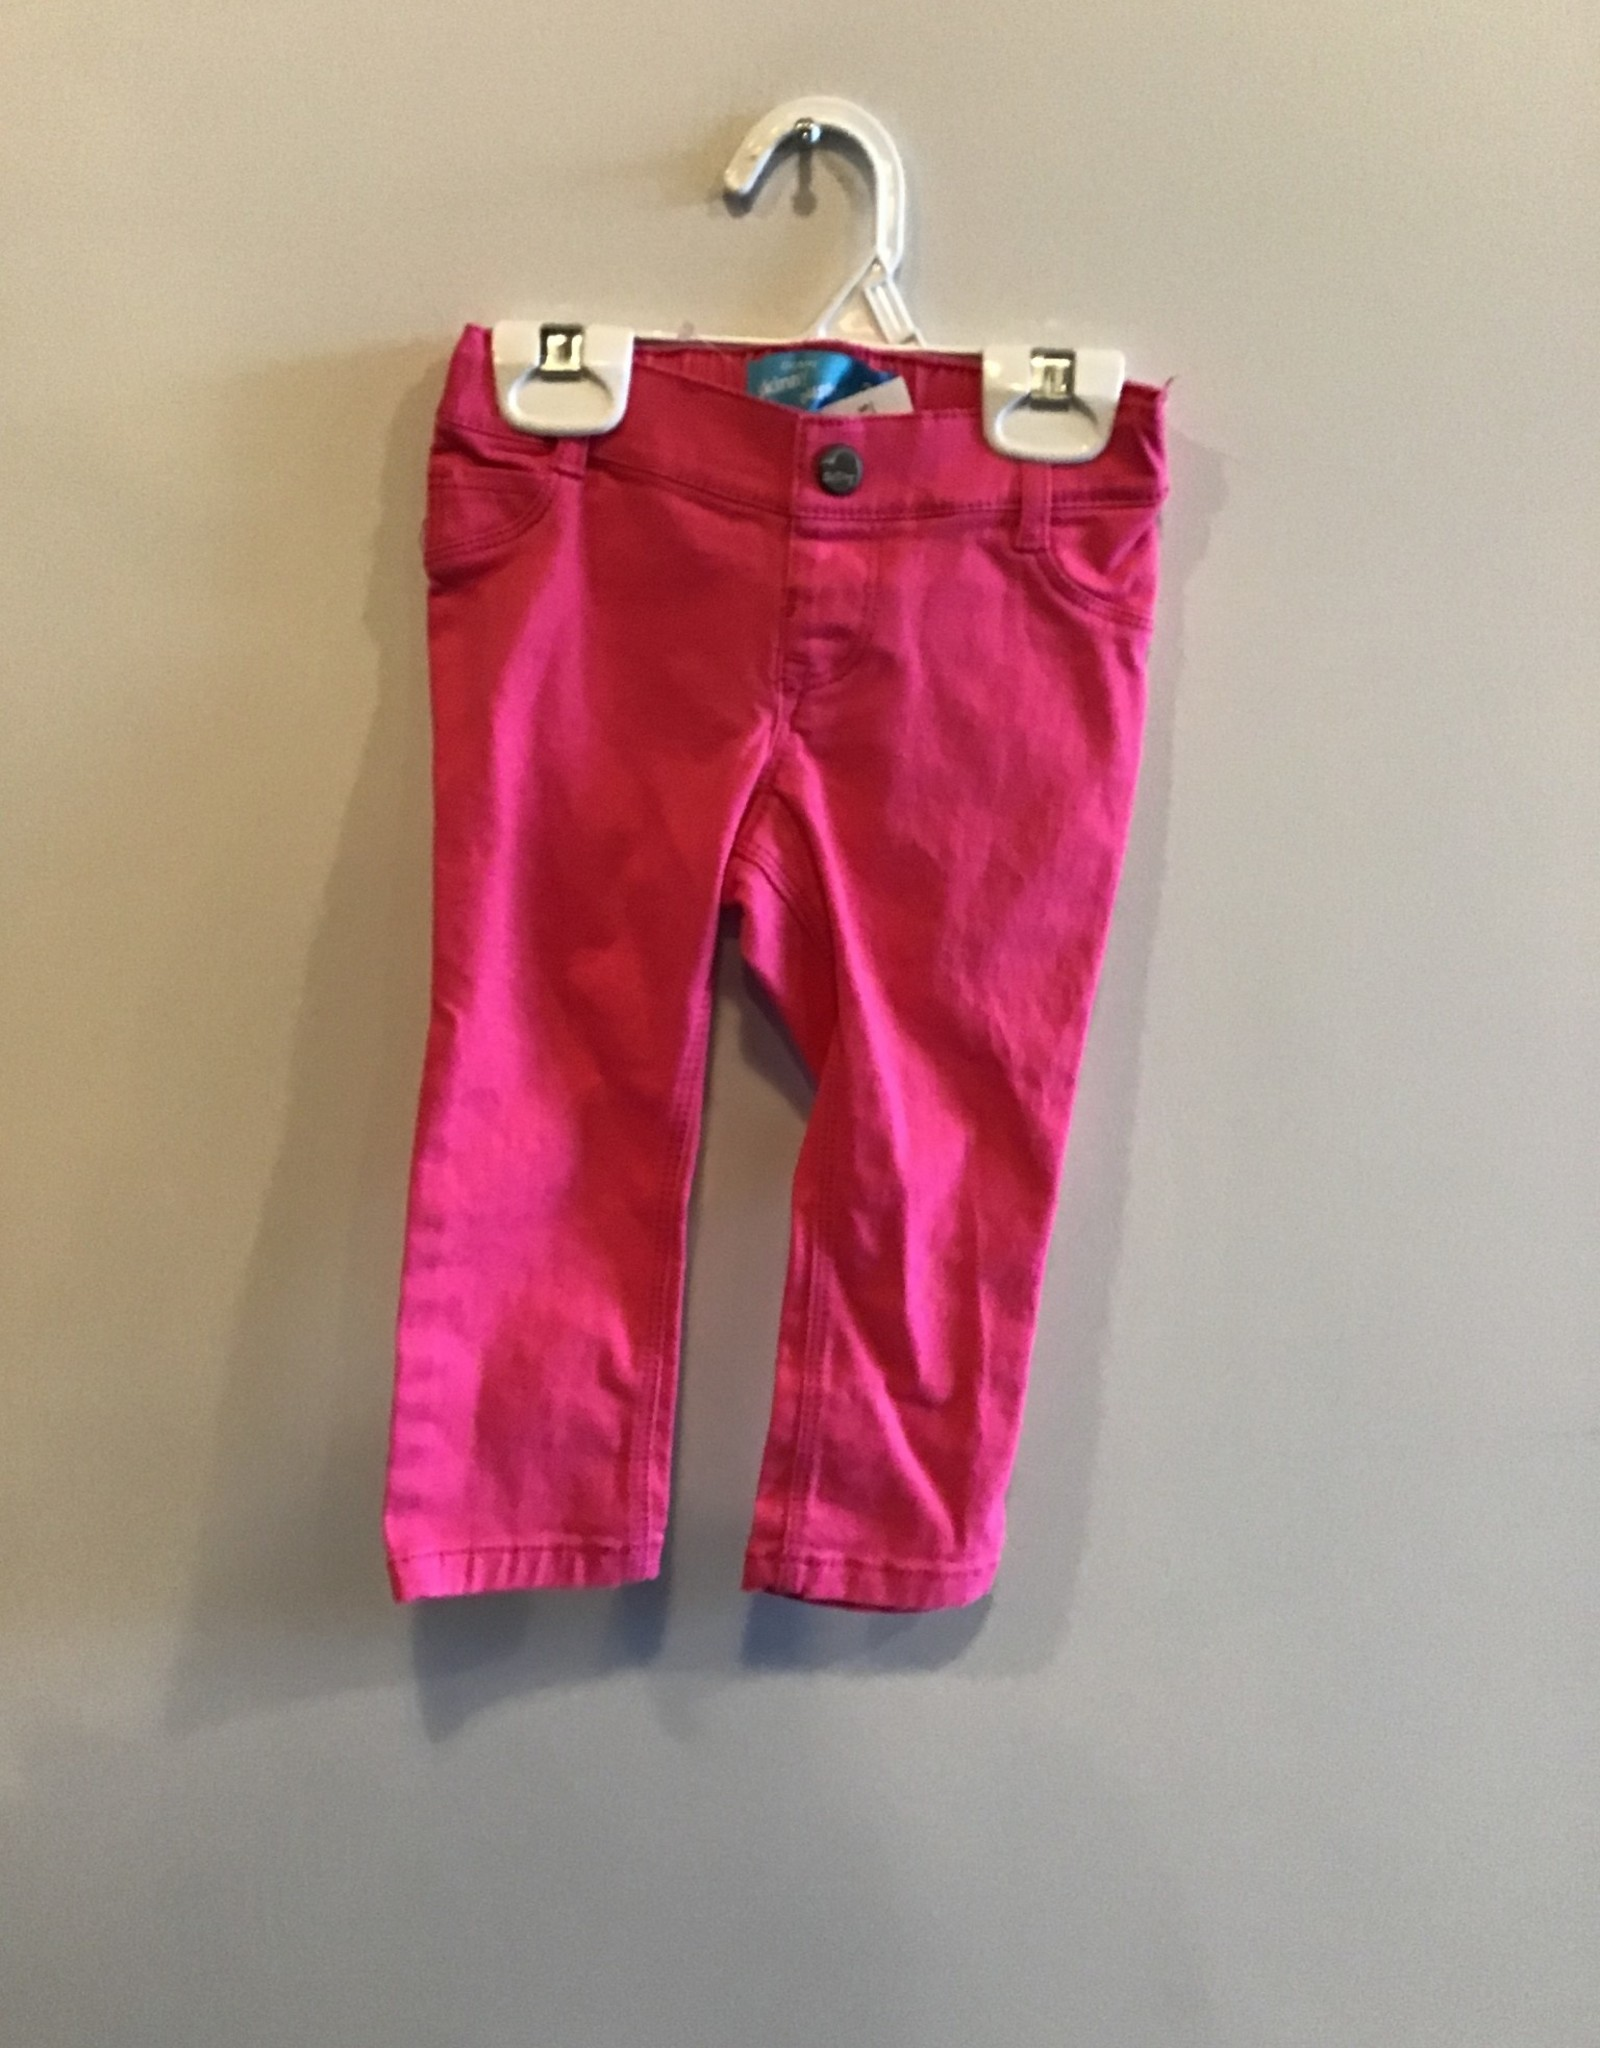 Old Navy Girls/2T/OldNavy/Pants